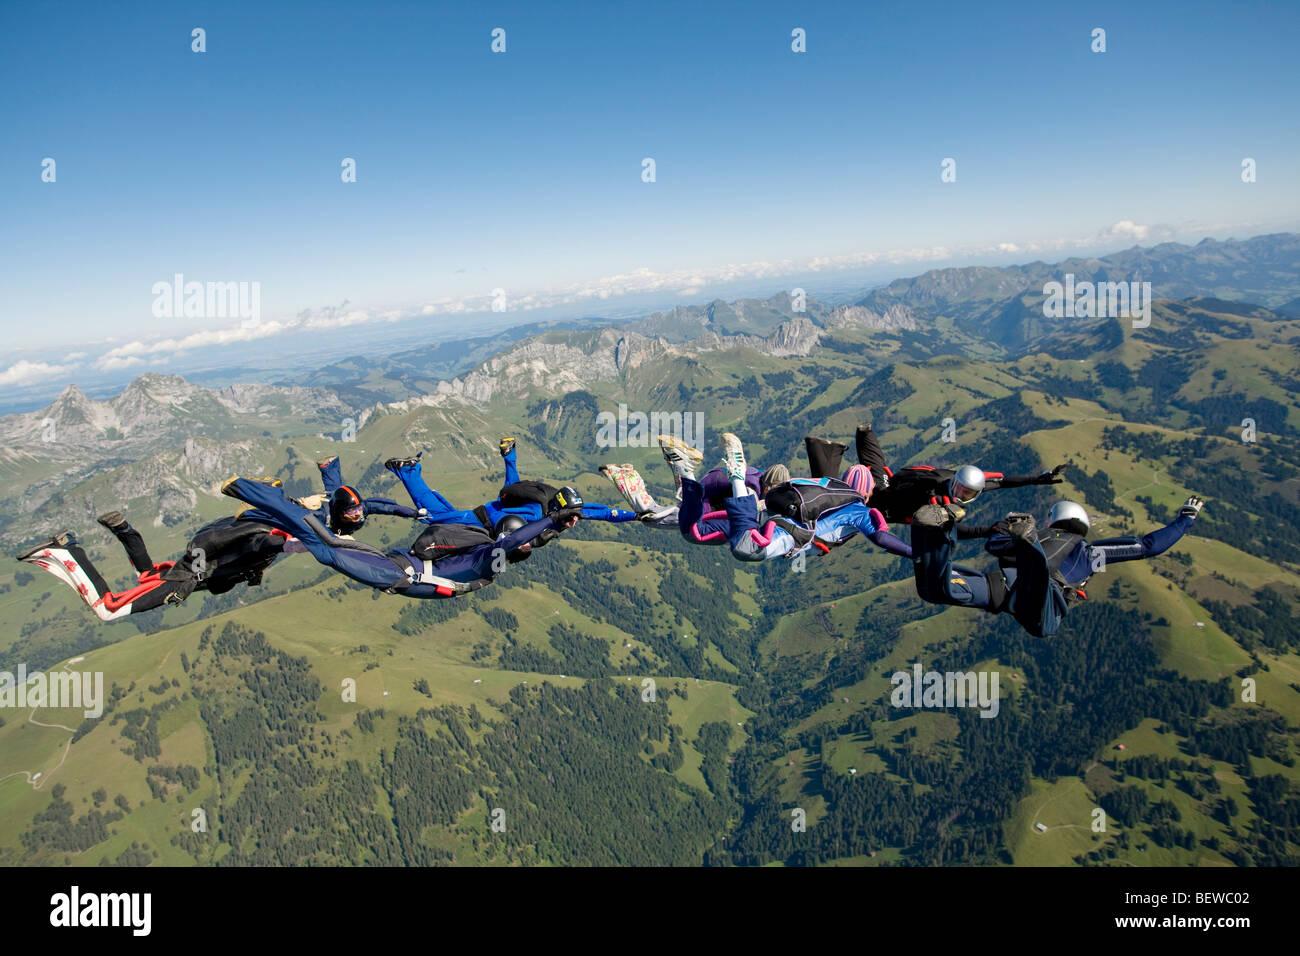 parachute jumping, full shot - Stock Image